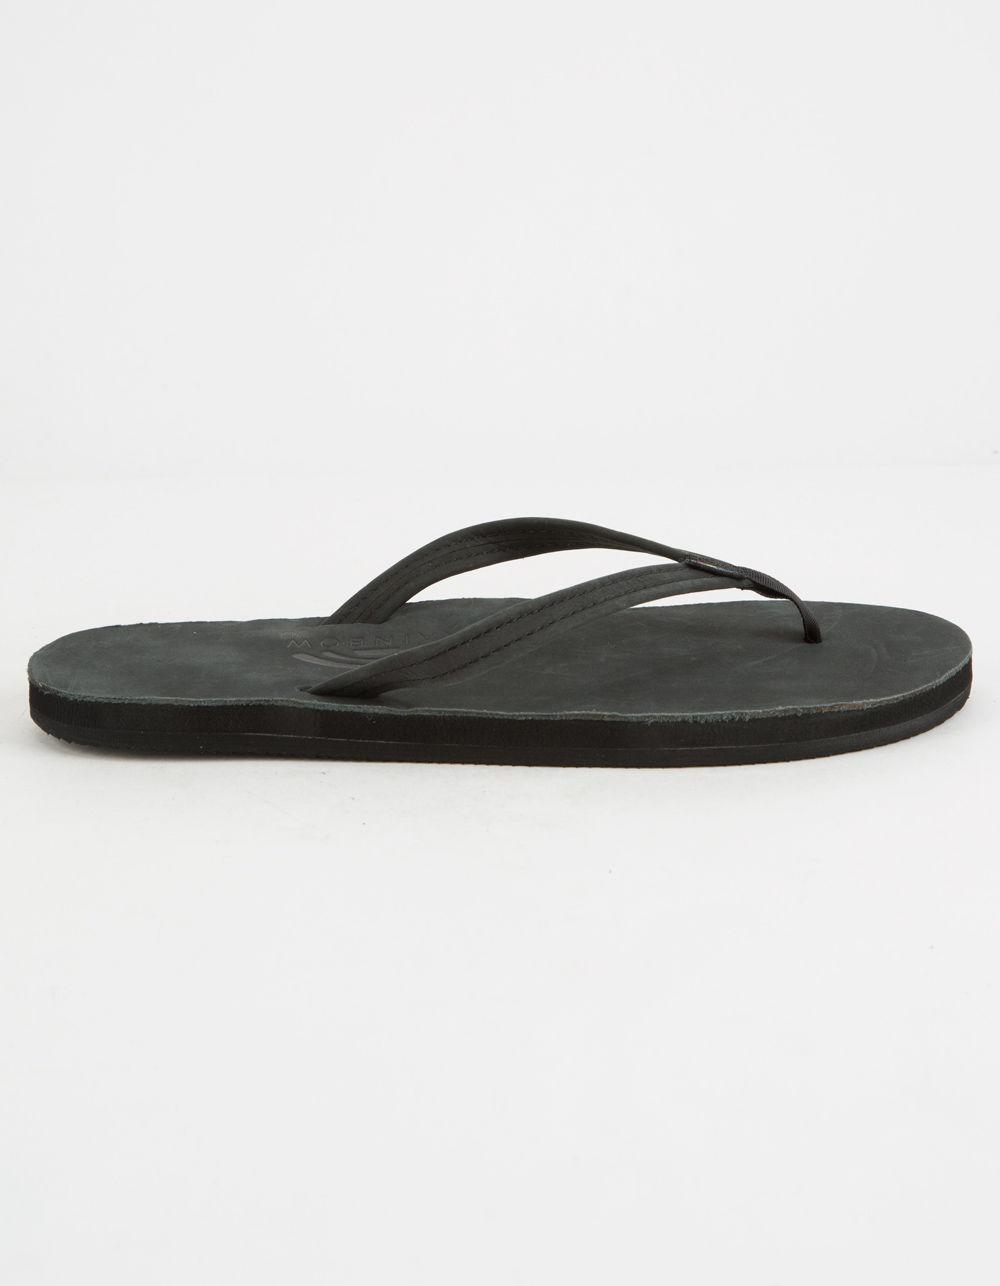 e9a88b703d60 Lyst - Rainbow Sandals Narrow Strap Black Womens Sandals in Black